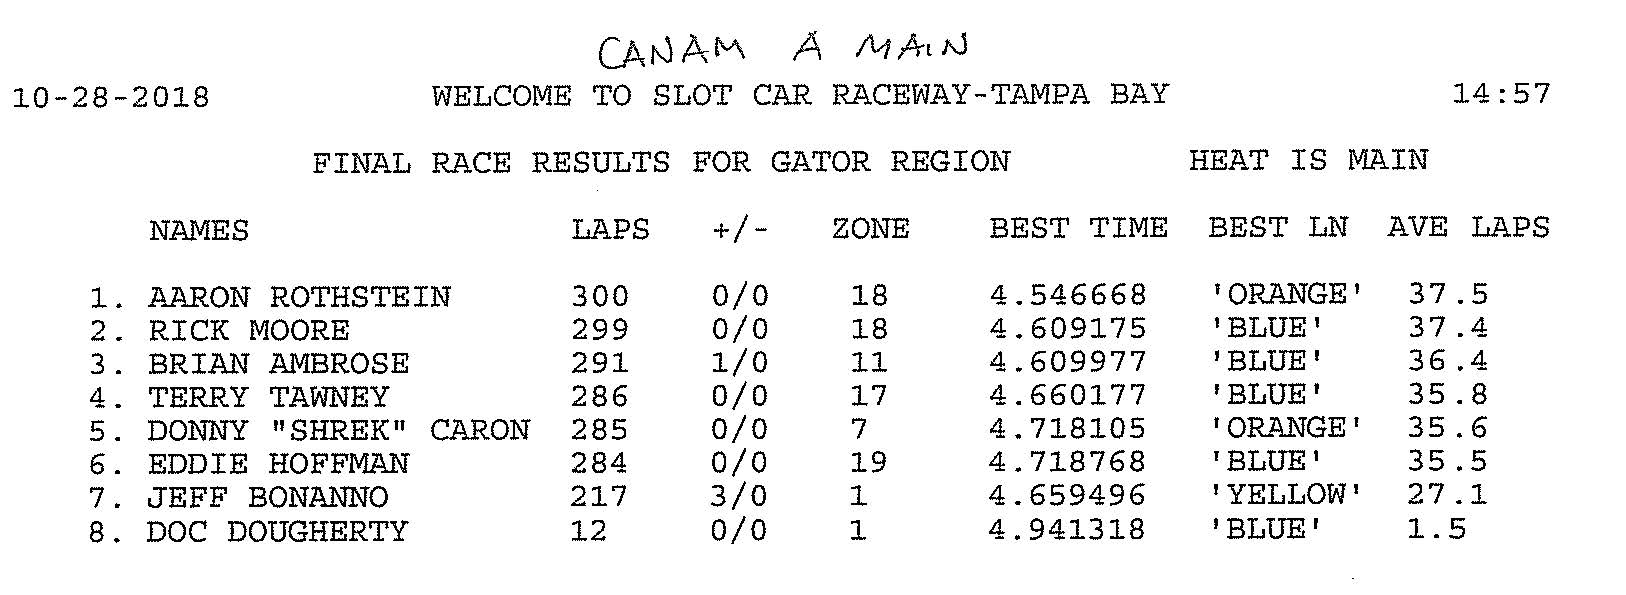 10.28.18 GRRR CanAm A Main Final Result.jpg